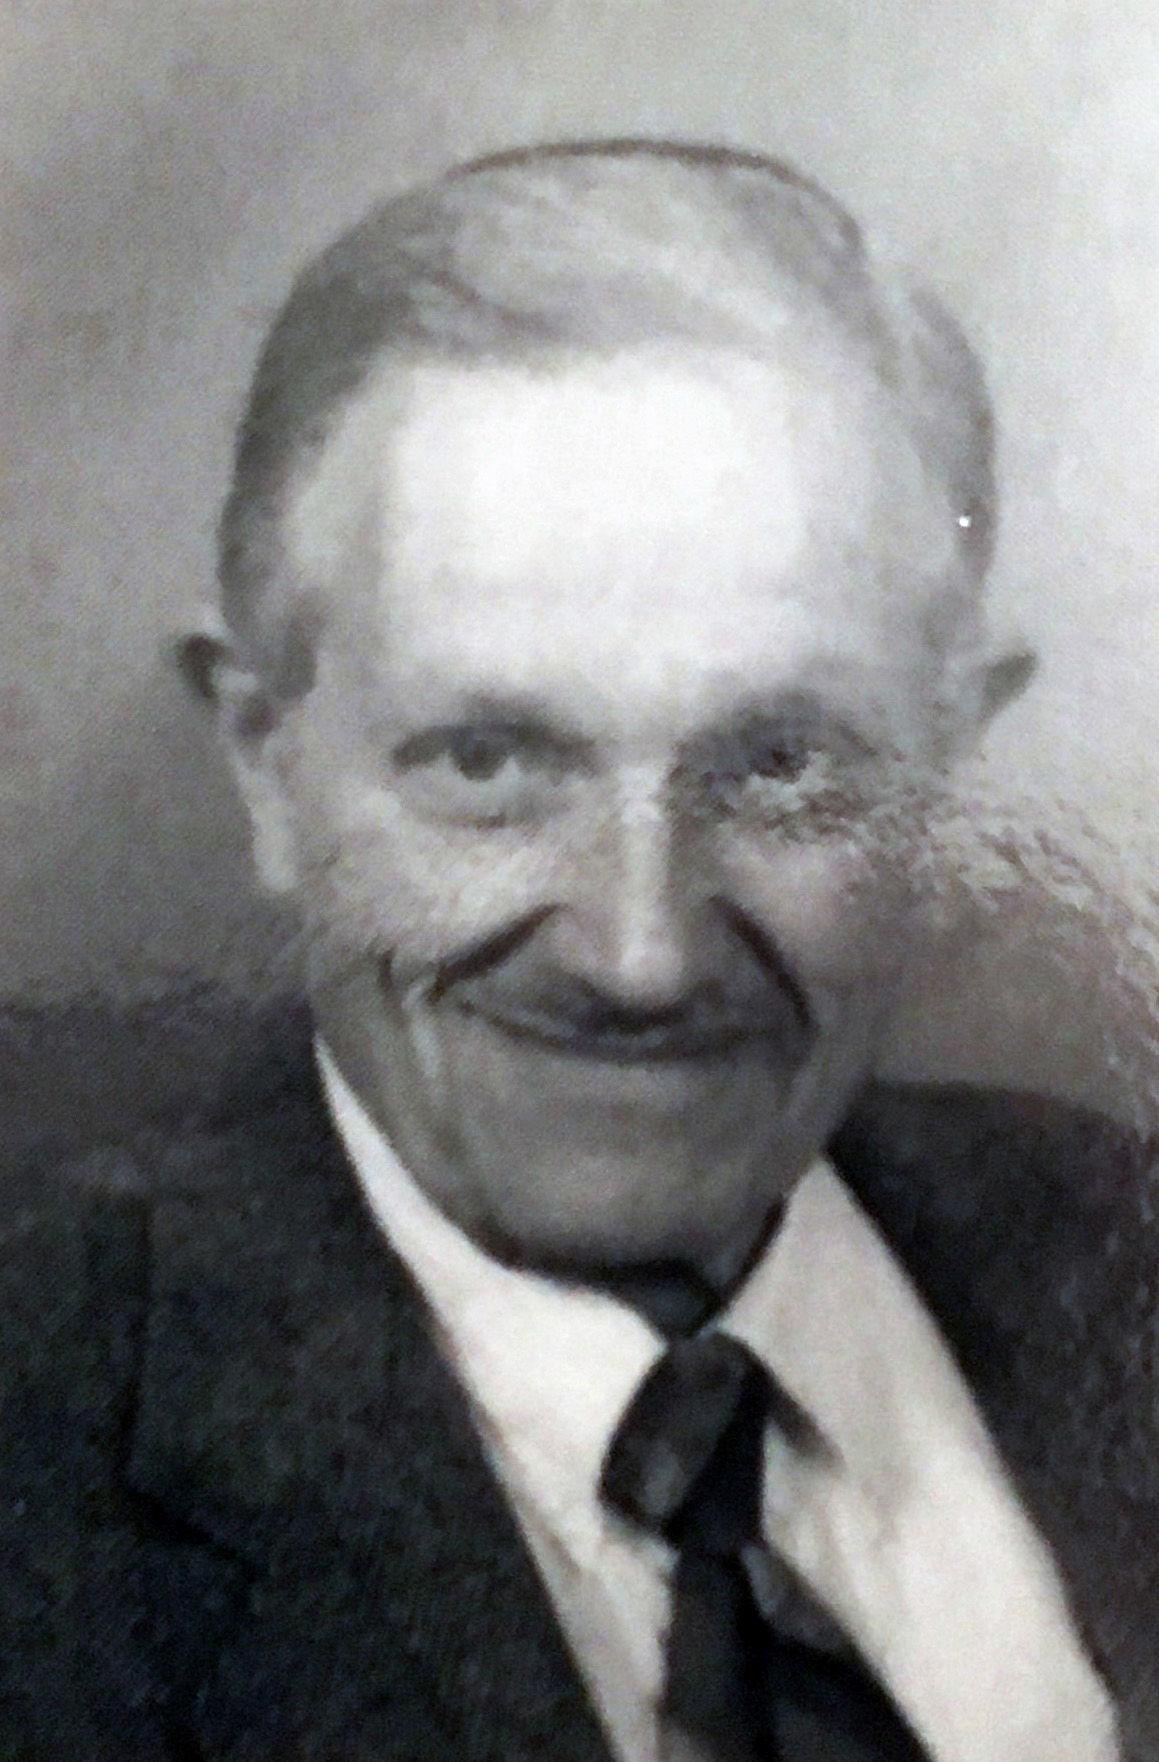 Irwin Goldenberg